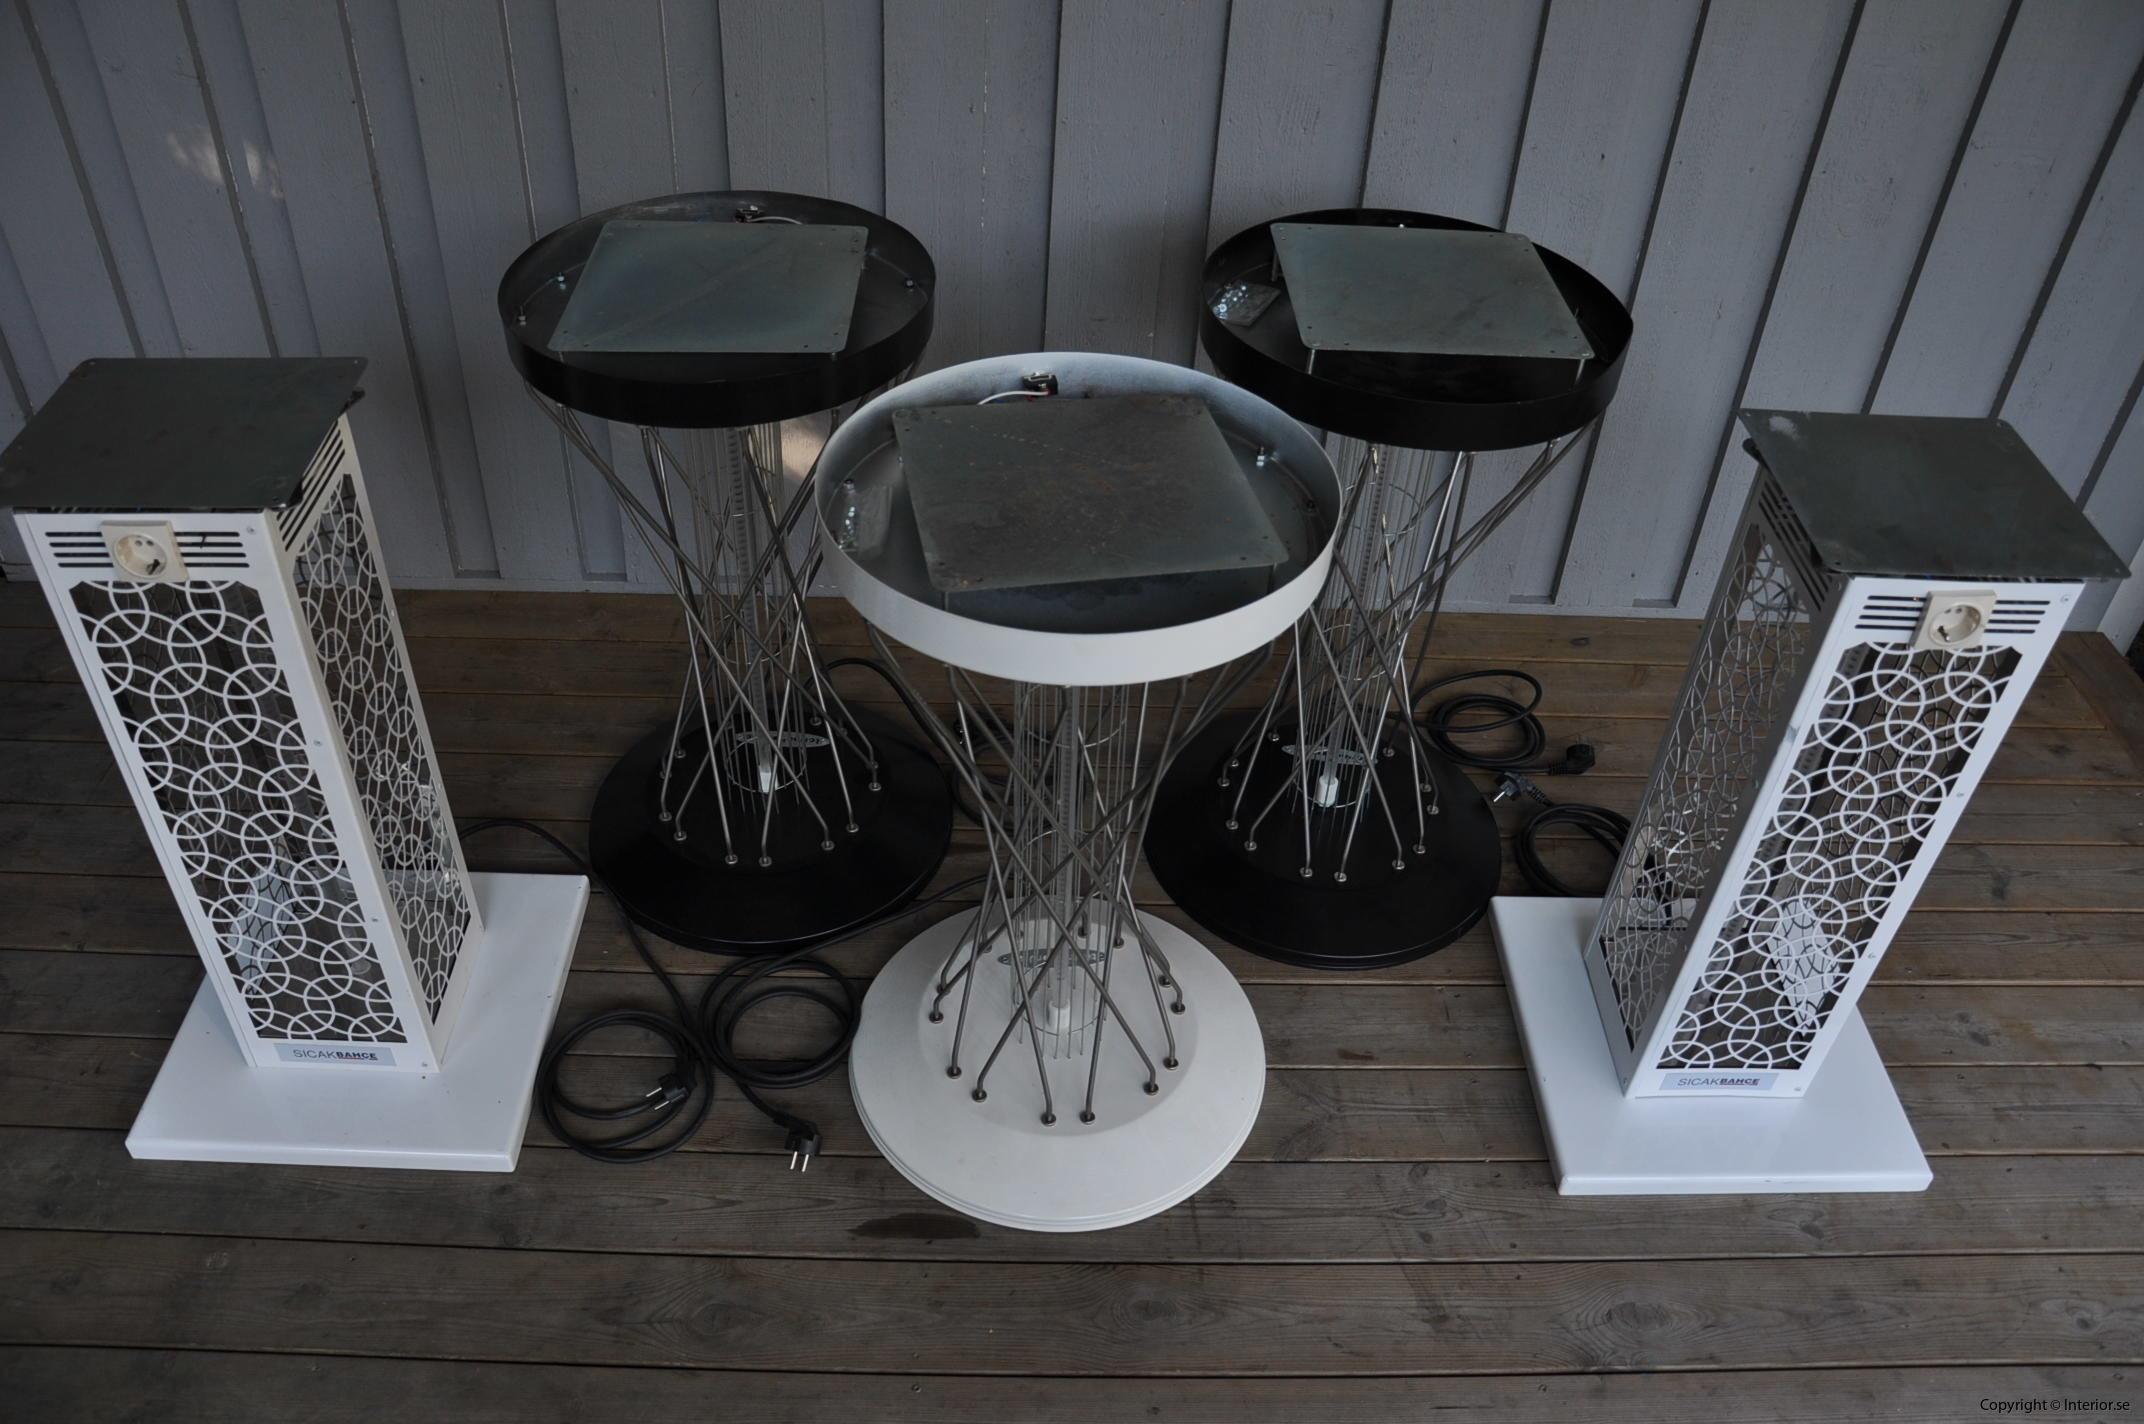 Bord med inbyggd infravärme Hyra möbler stockholm event sverige (2)